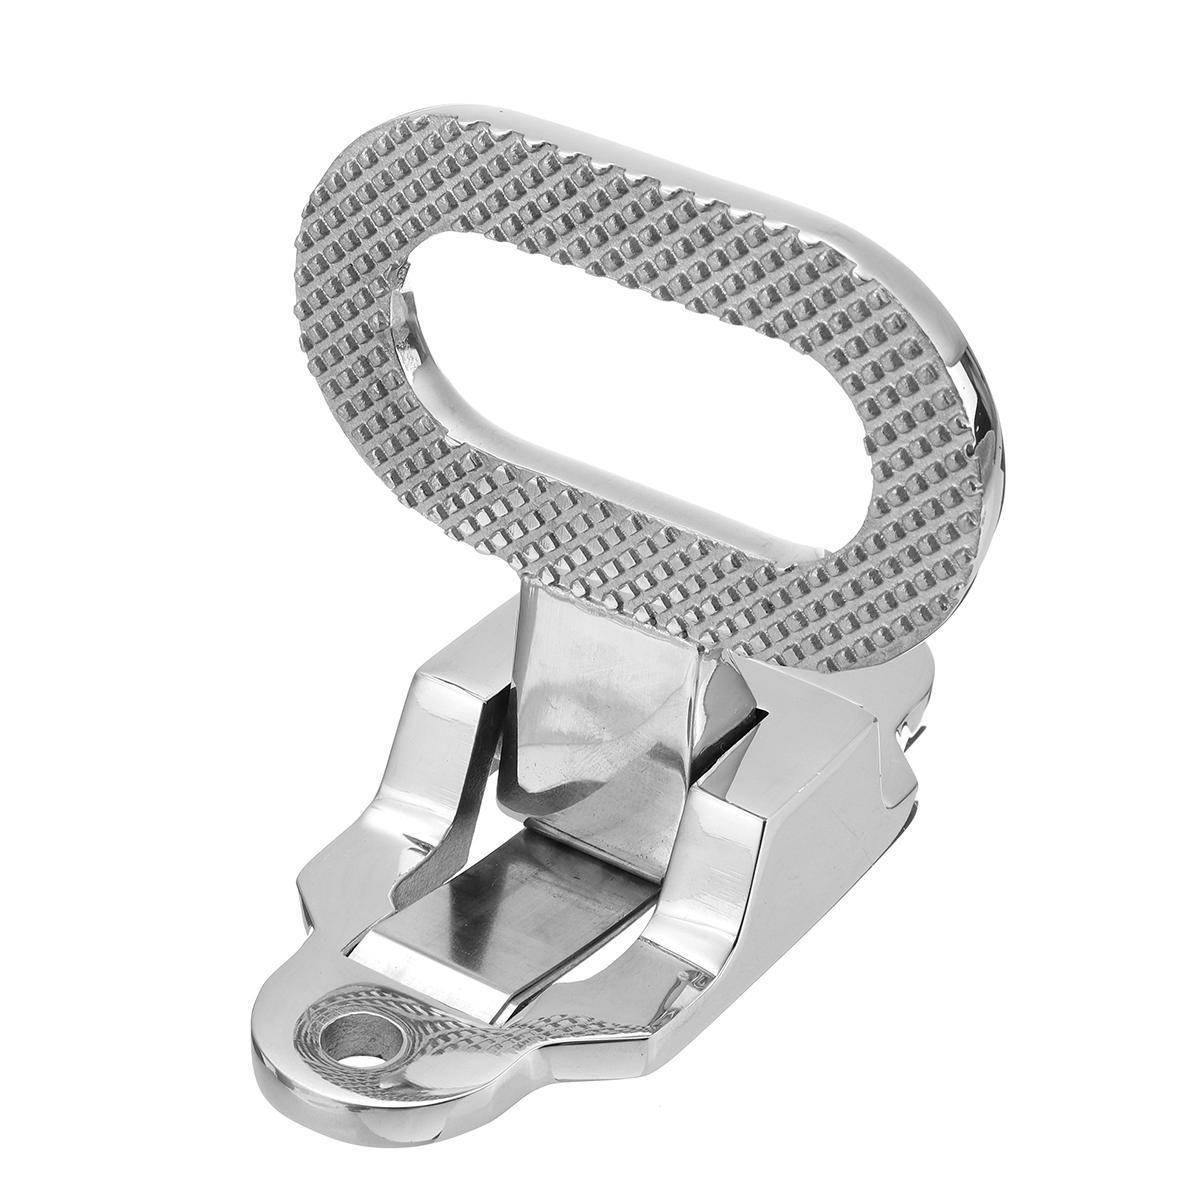 Folding Non-slip 316 Stainless Steel Folding Step Pedal Bracket For Marine Boat Yacht Car